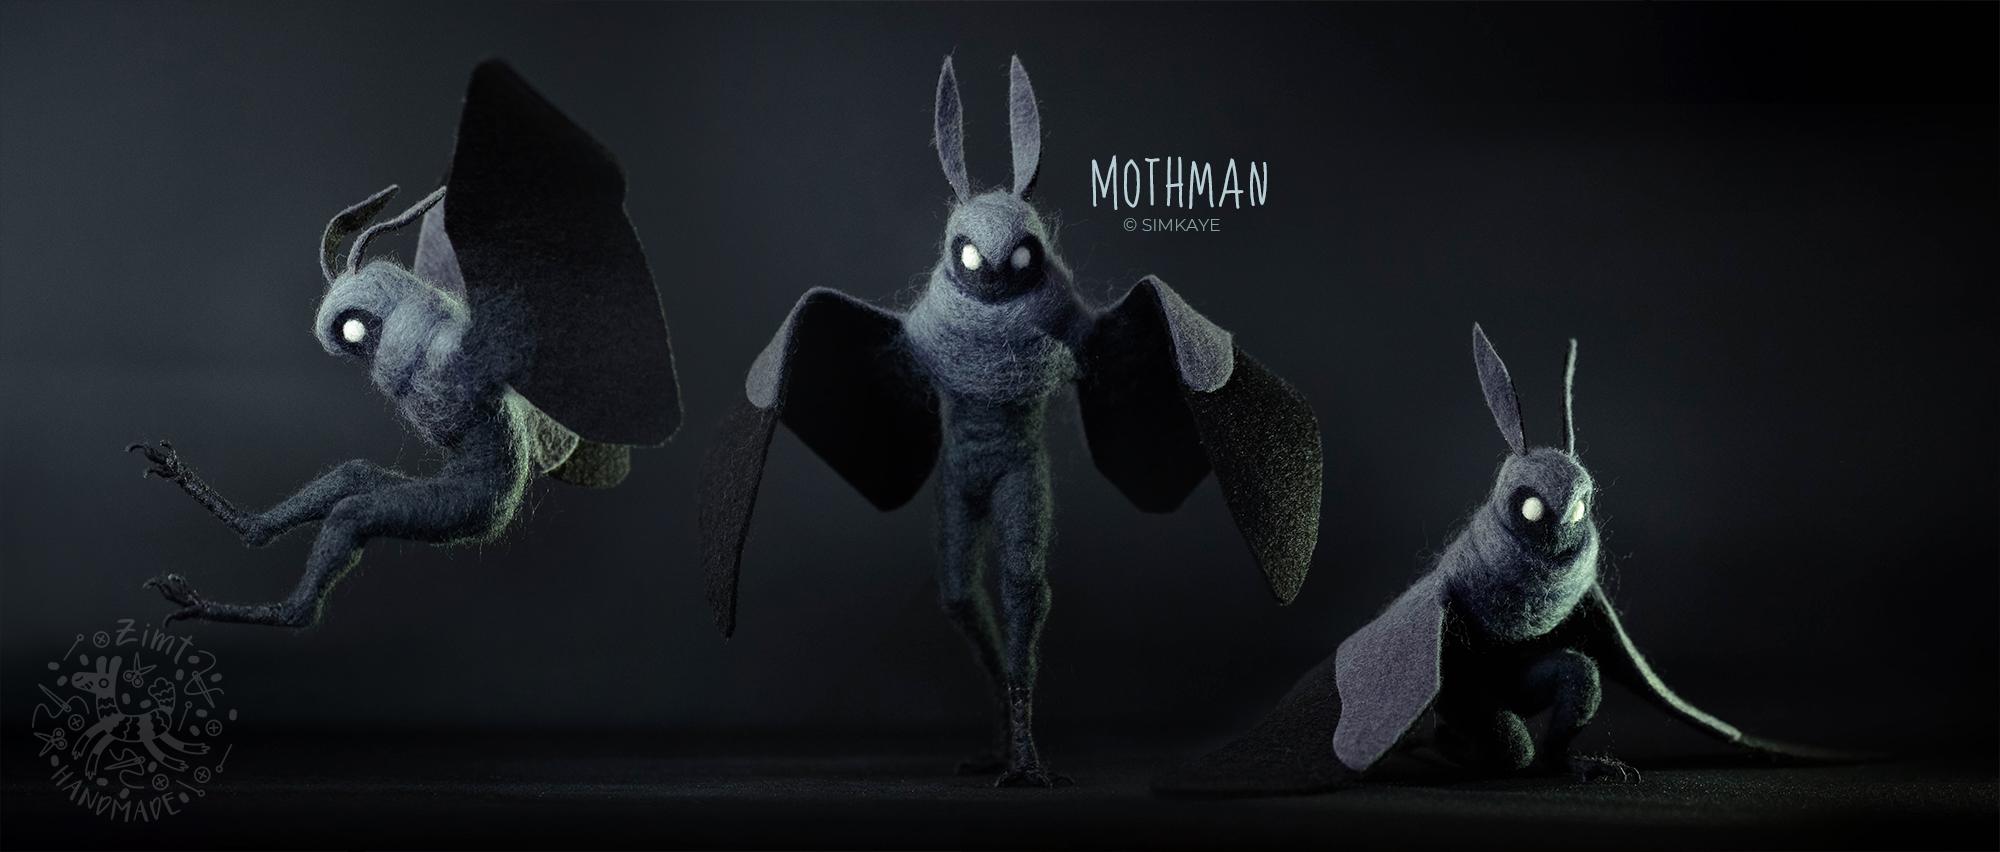 [NF] Mothman